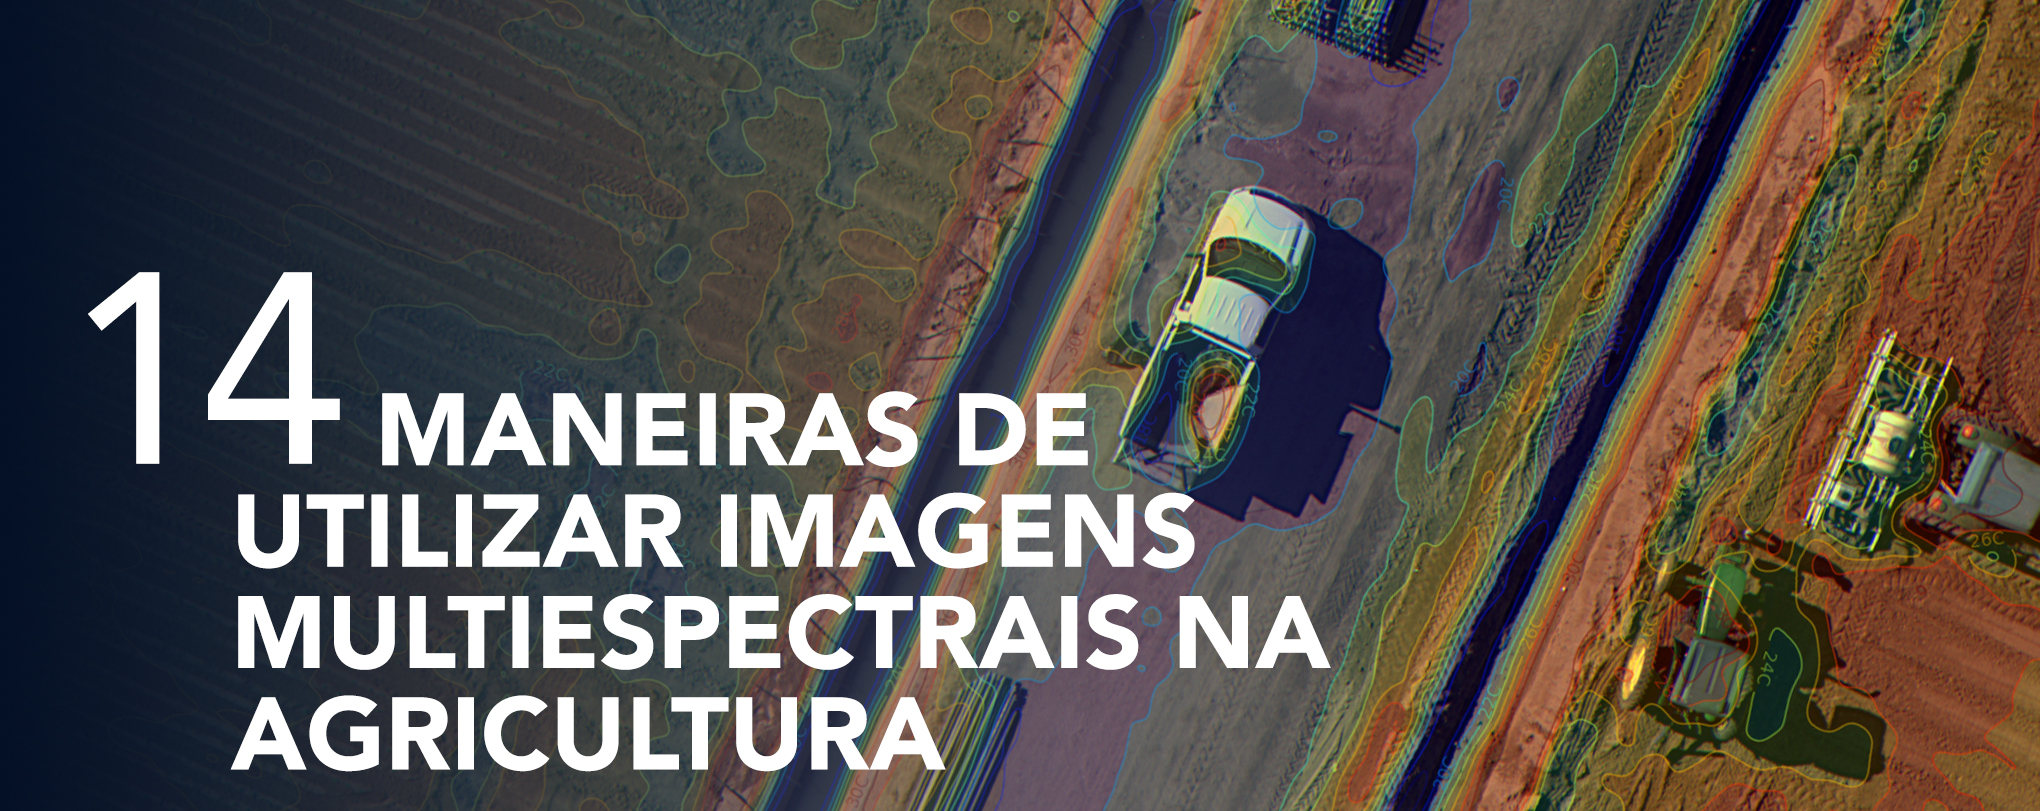 Why Multispectral_webbanner_Portuguese.jpg